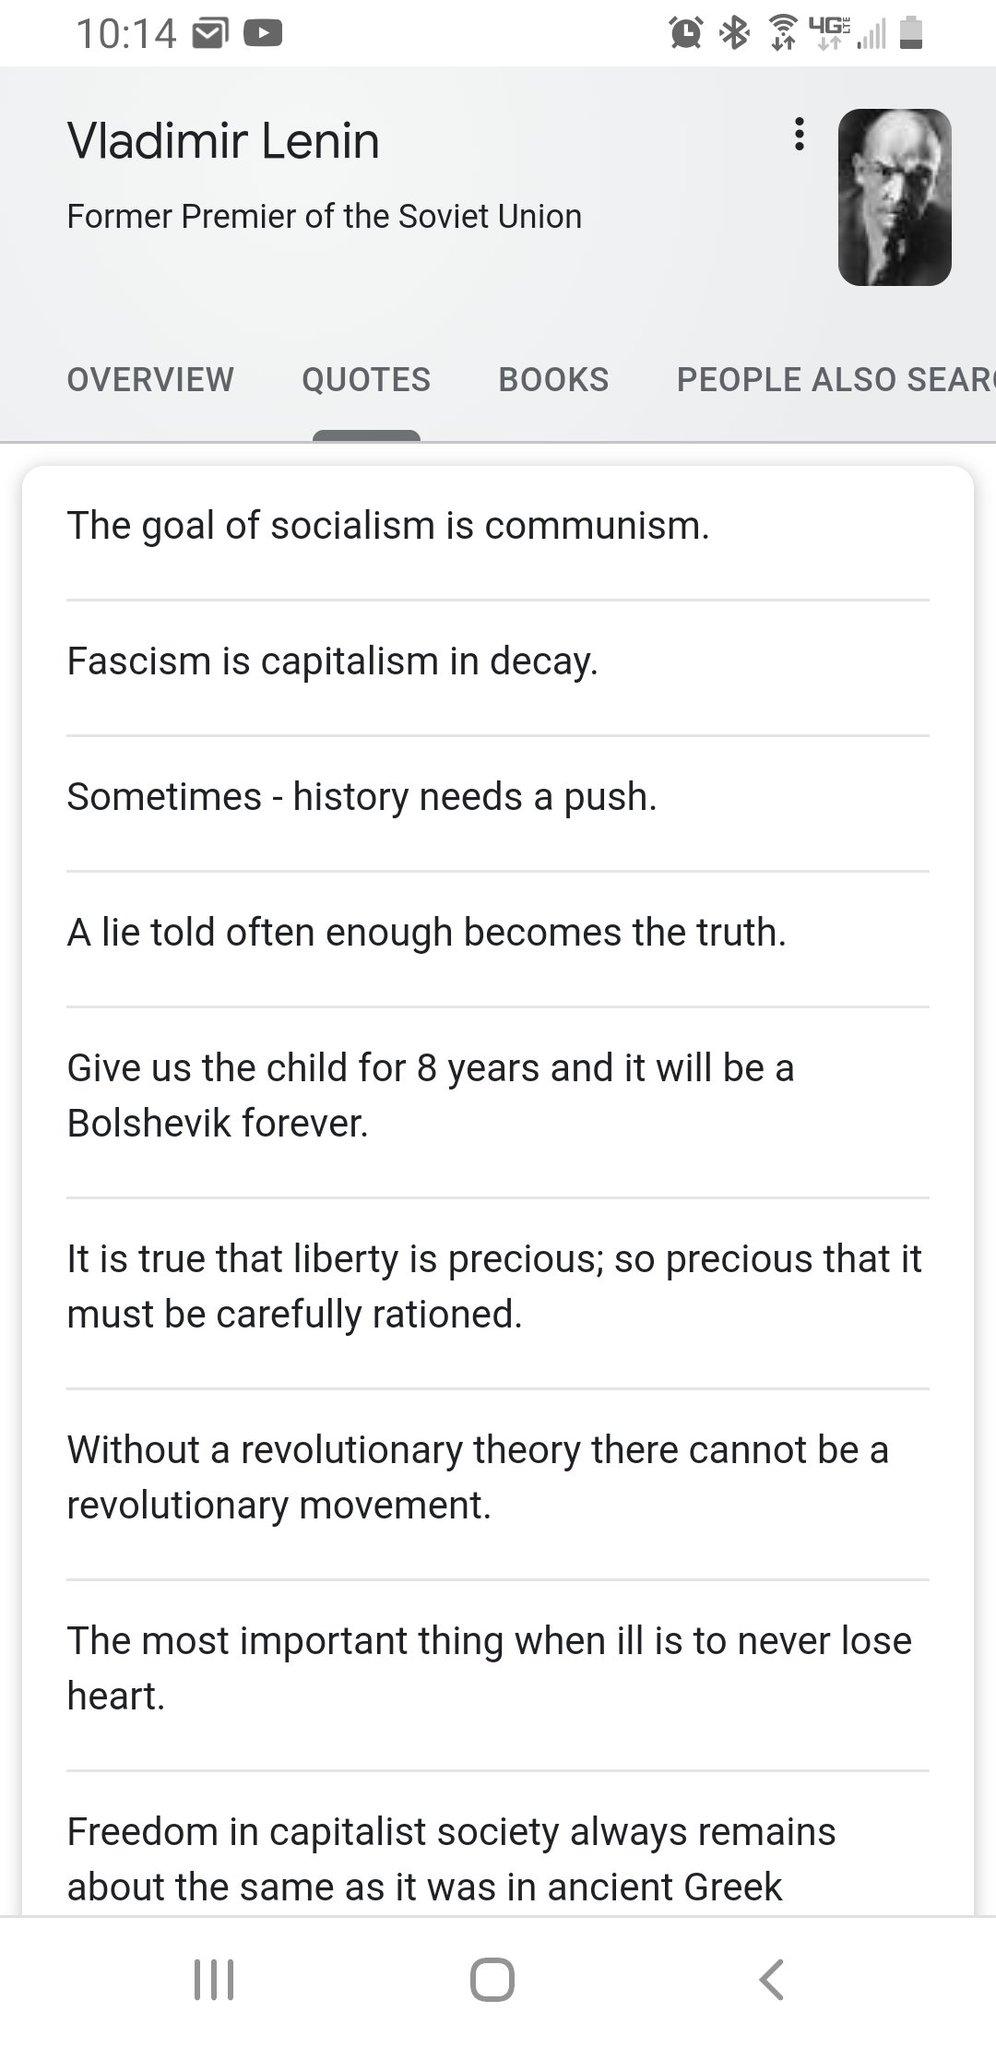 Lenin Quotes - meme